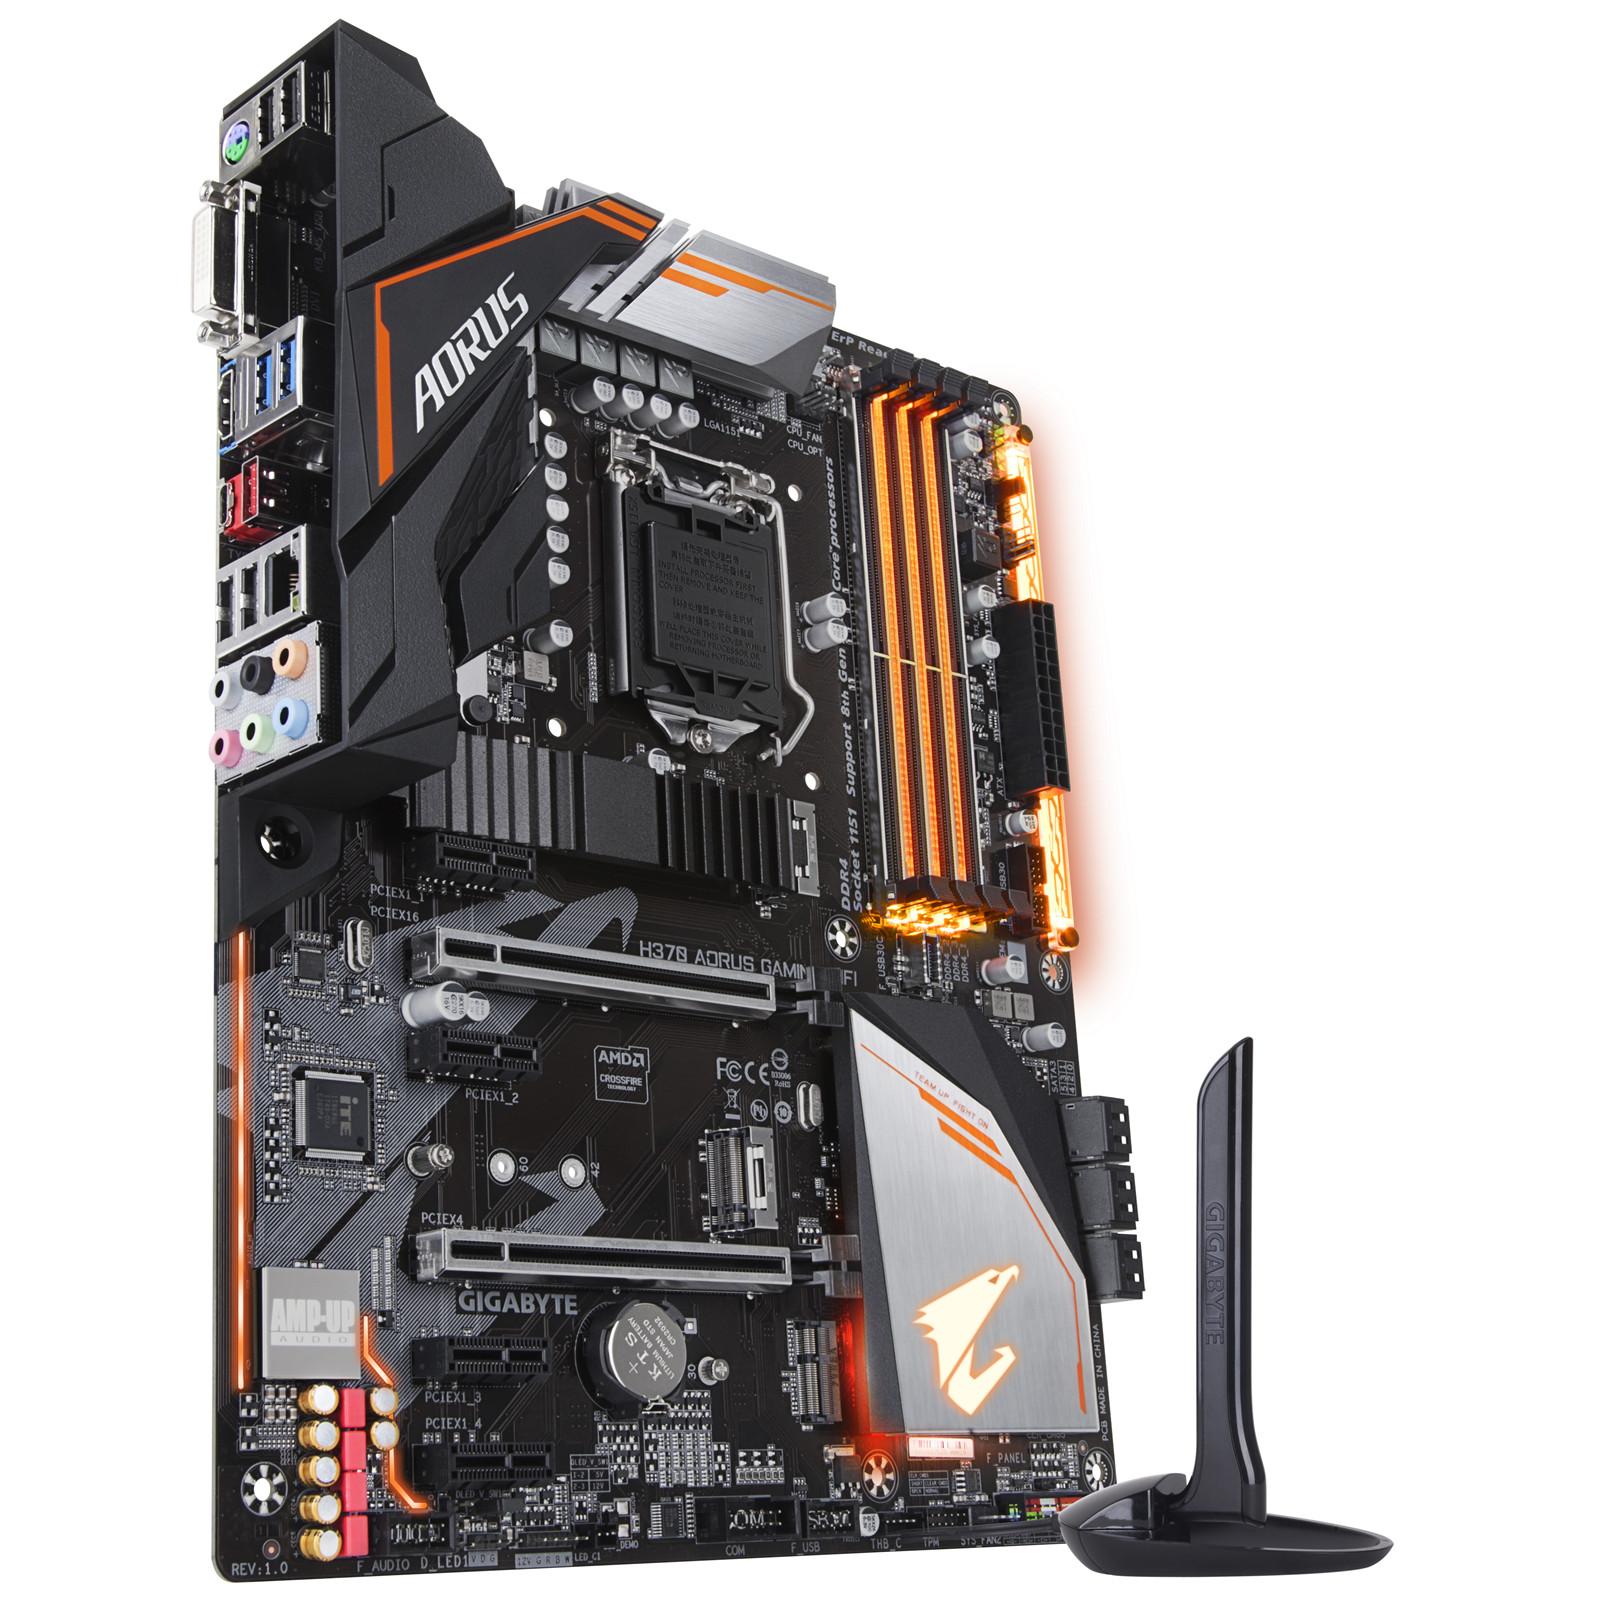 Buy the Gigabyte H370 AORUS GAMING 3 WIFI ATX For Intel 8th